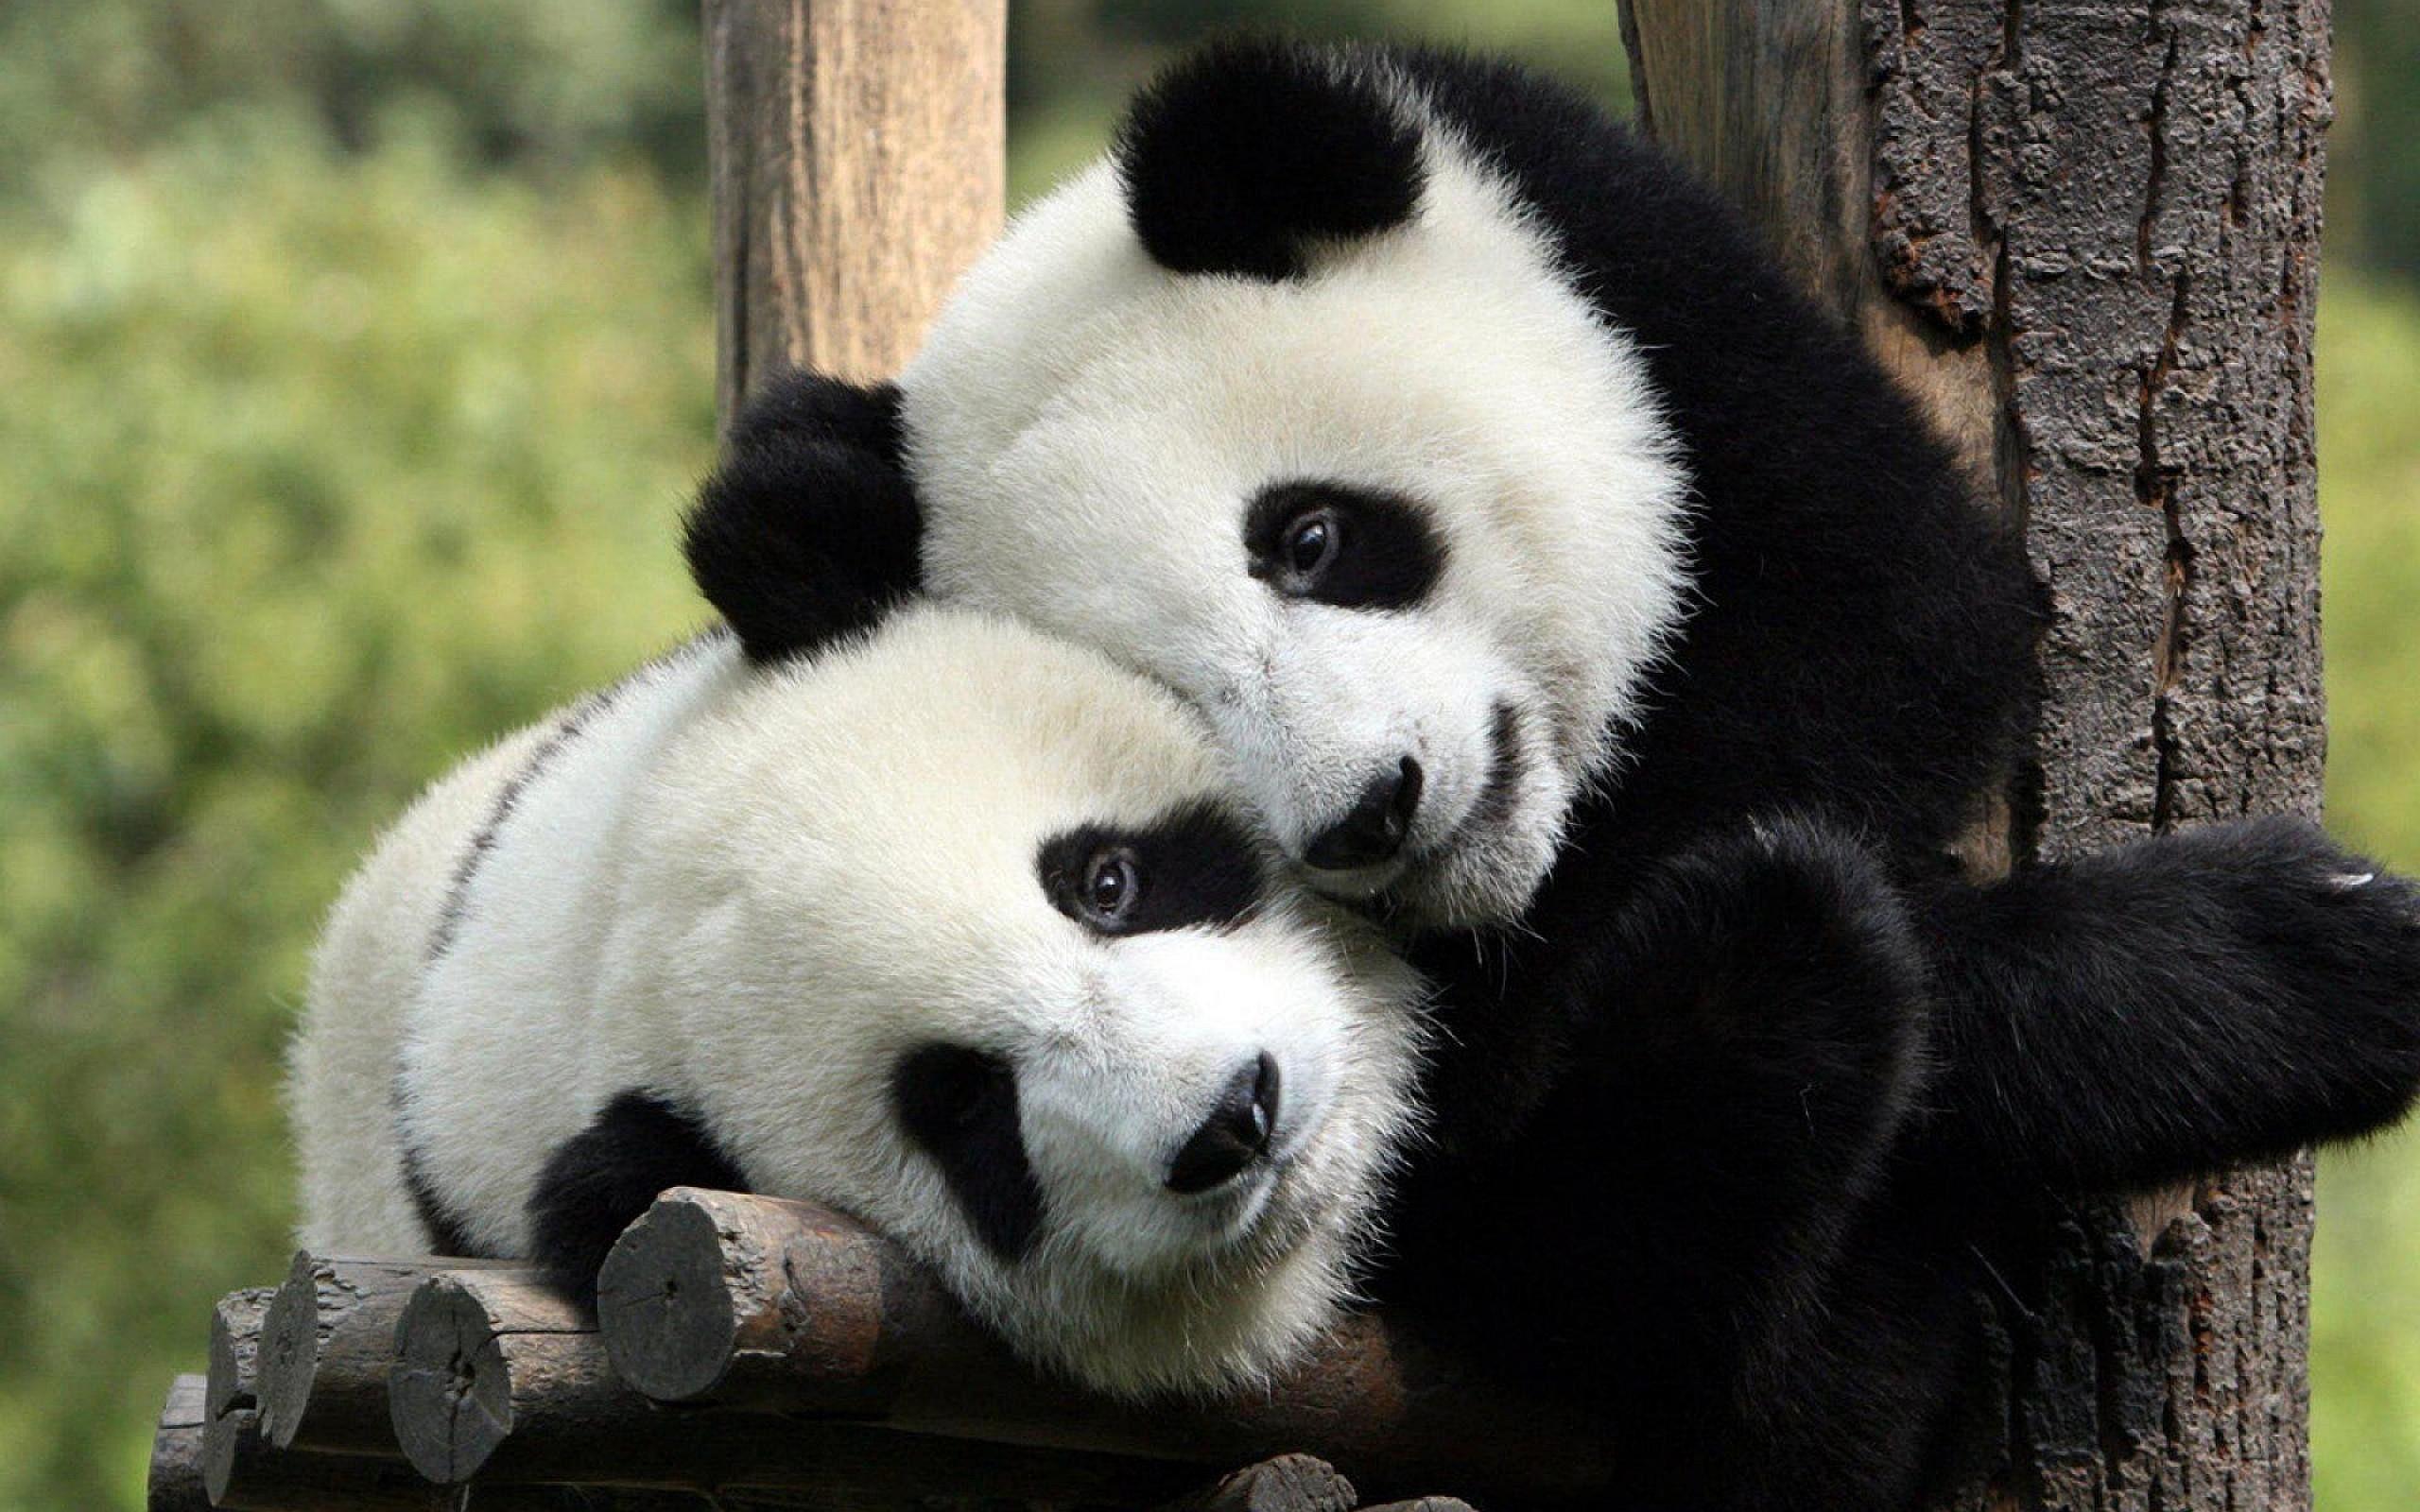 Panda dili çözüldü